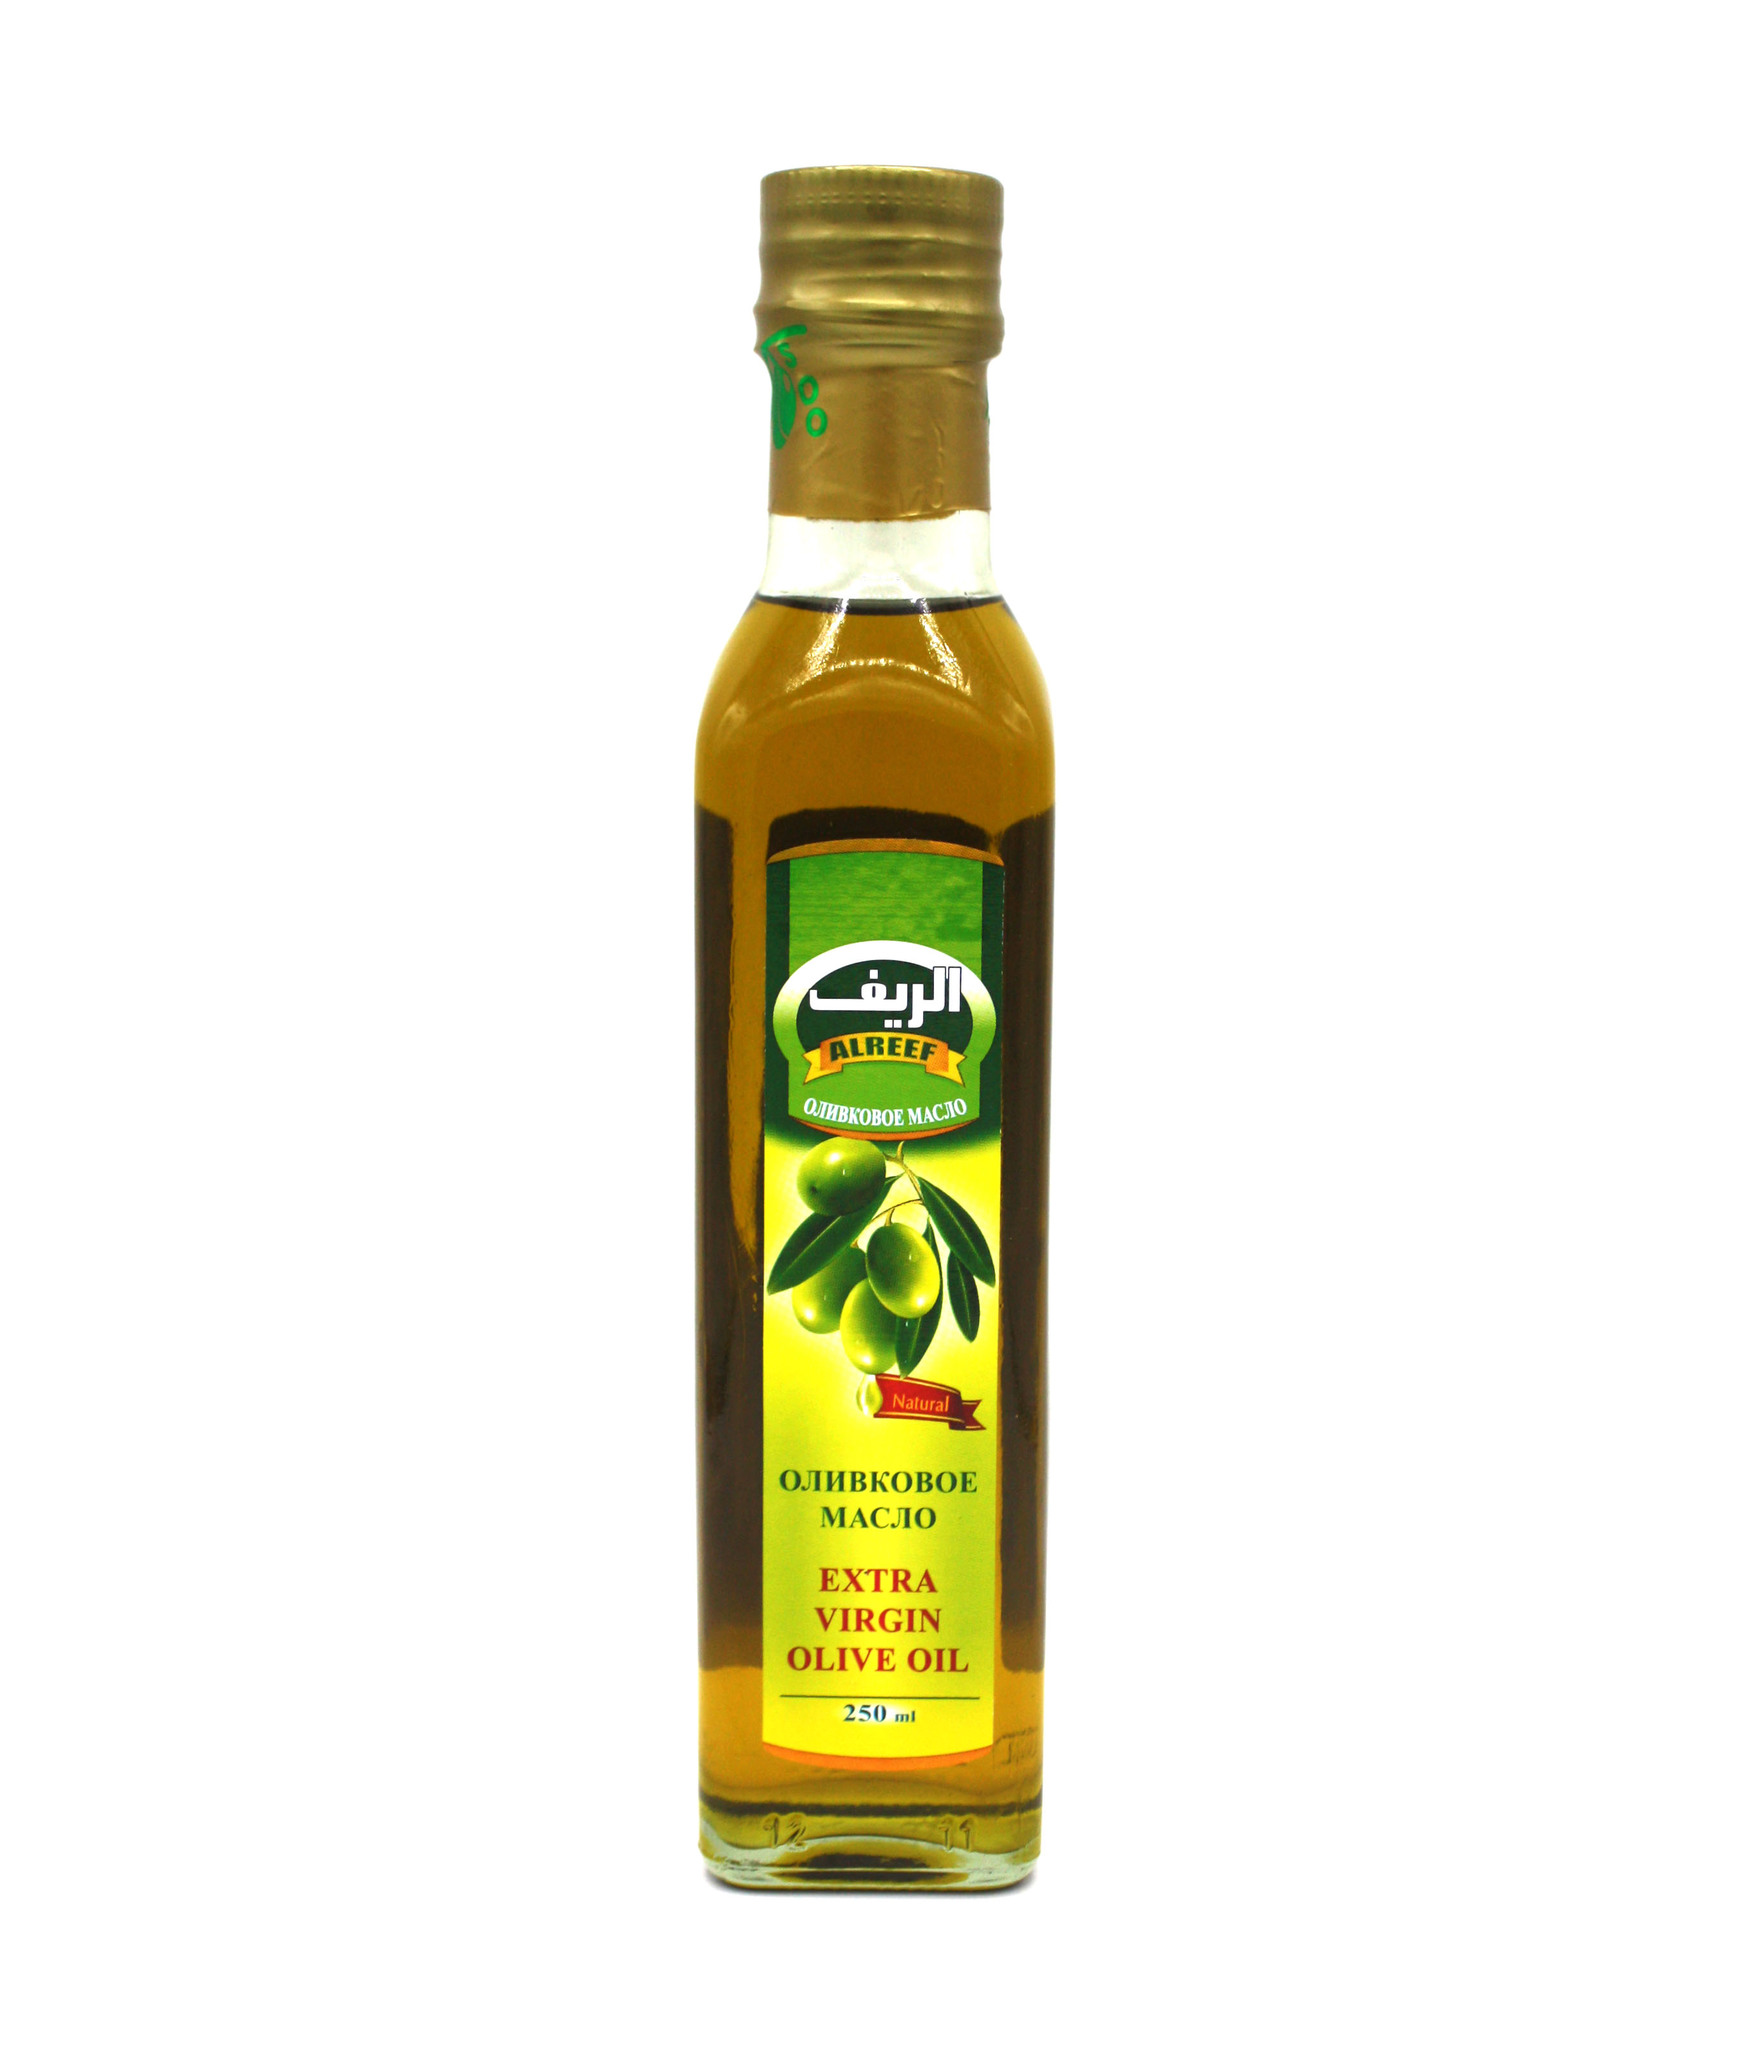 Оливковое масло Al Reef, 250 мл import_files_a2_a24b6a3d67e911e89d8f448a5b3752ae_da0404c9657a11e8a996484d7ecee297.jpg